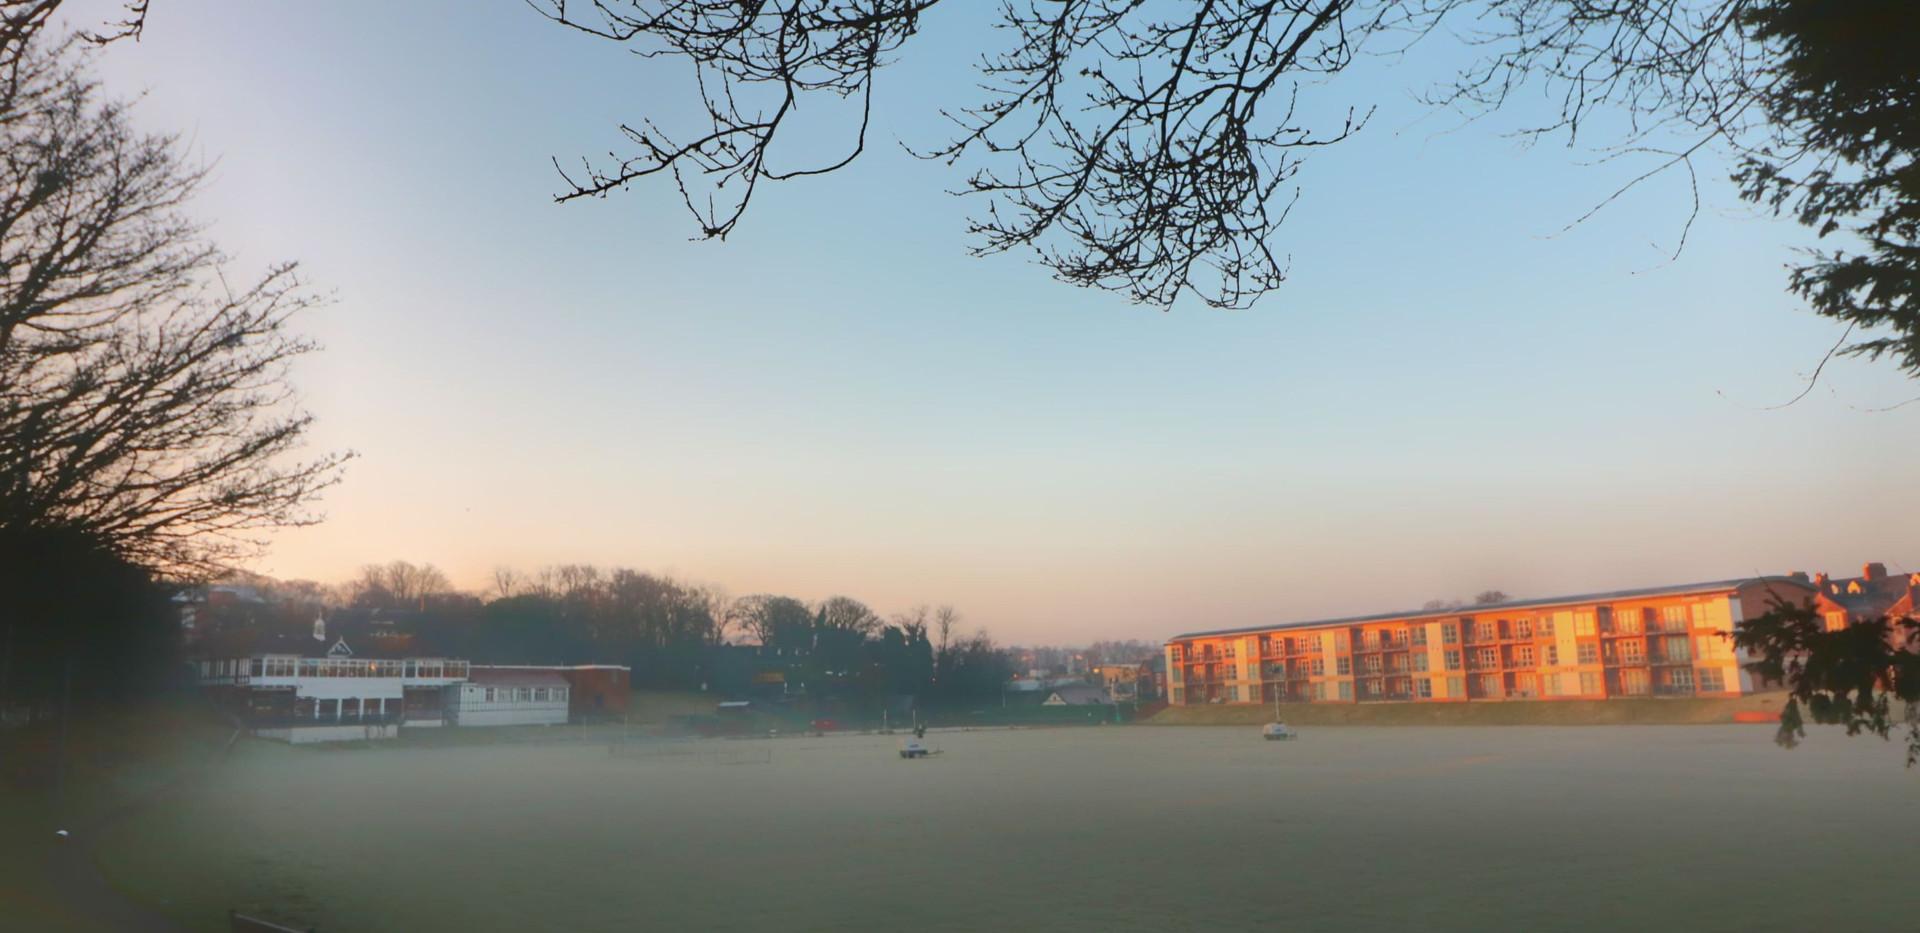 Misty at Ashbrooke